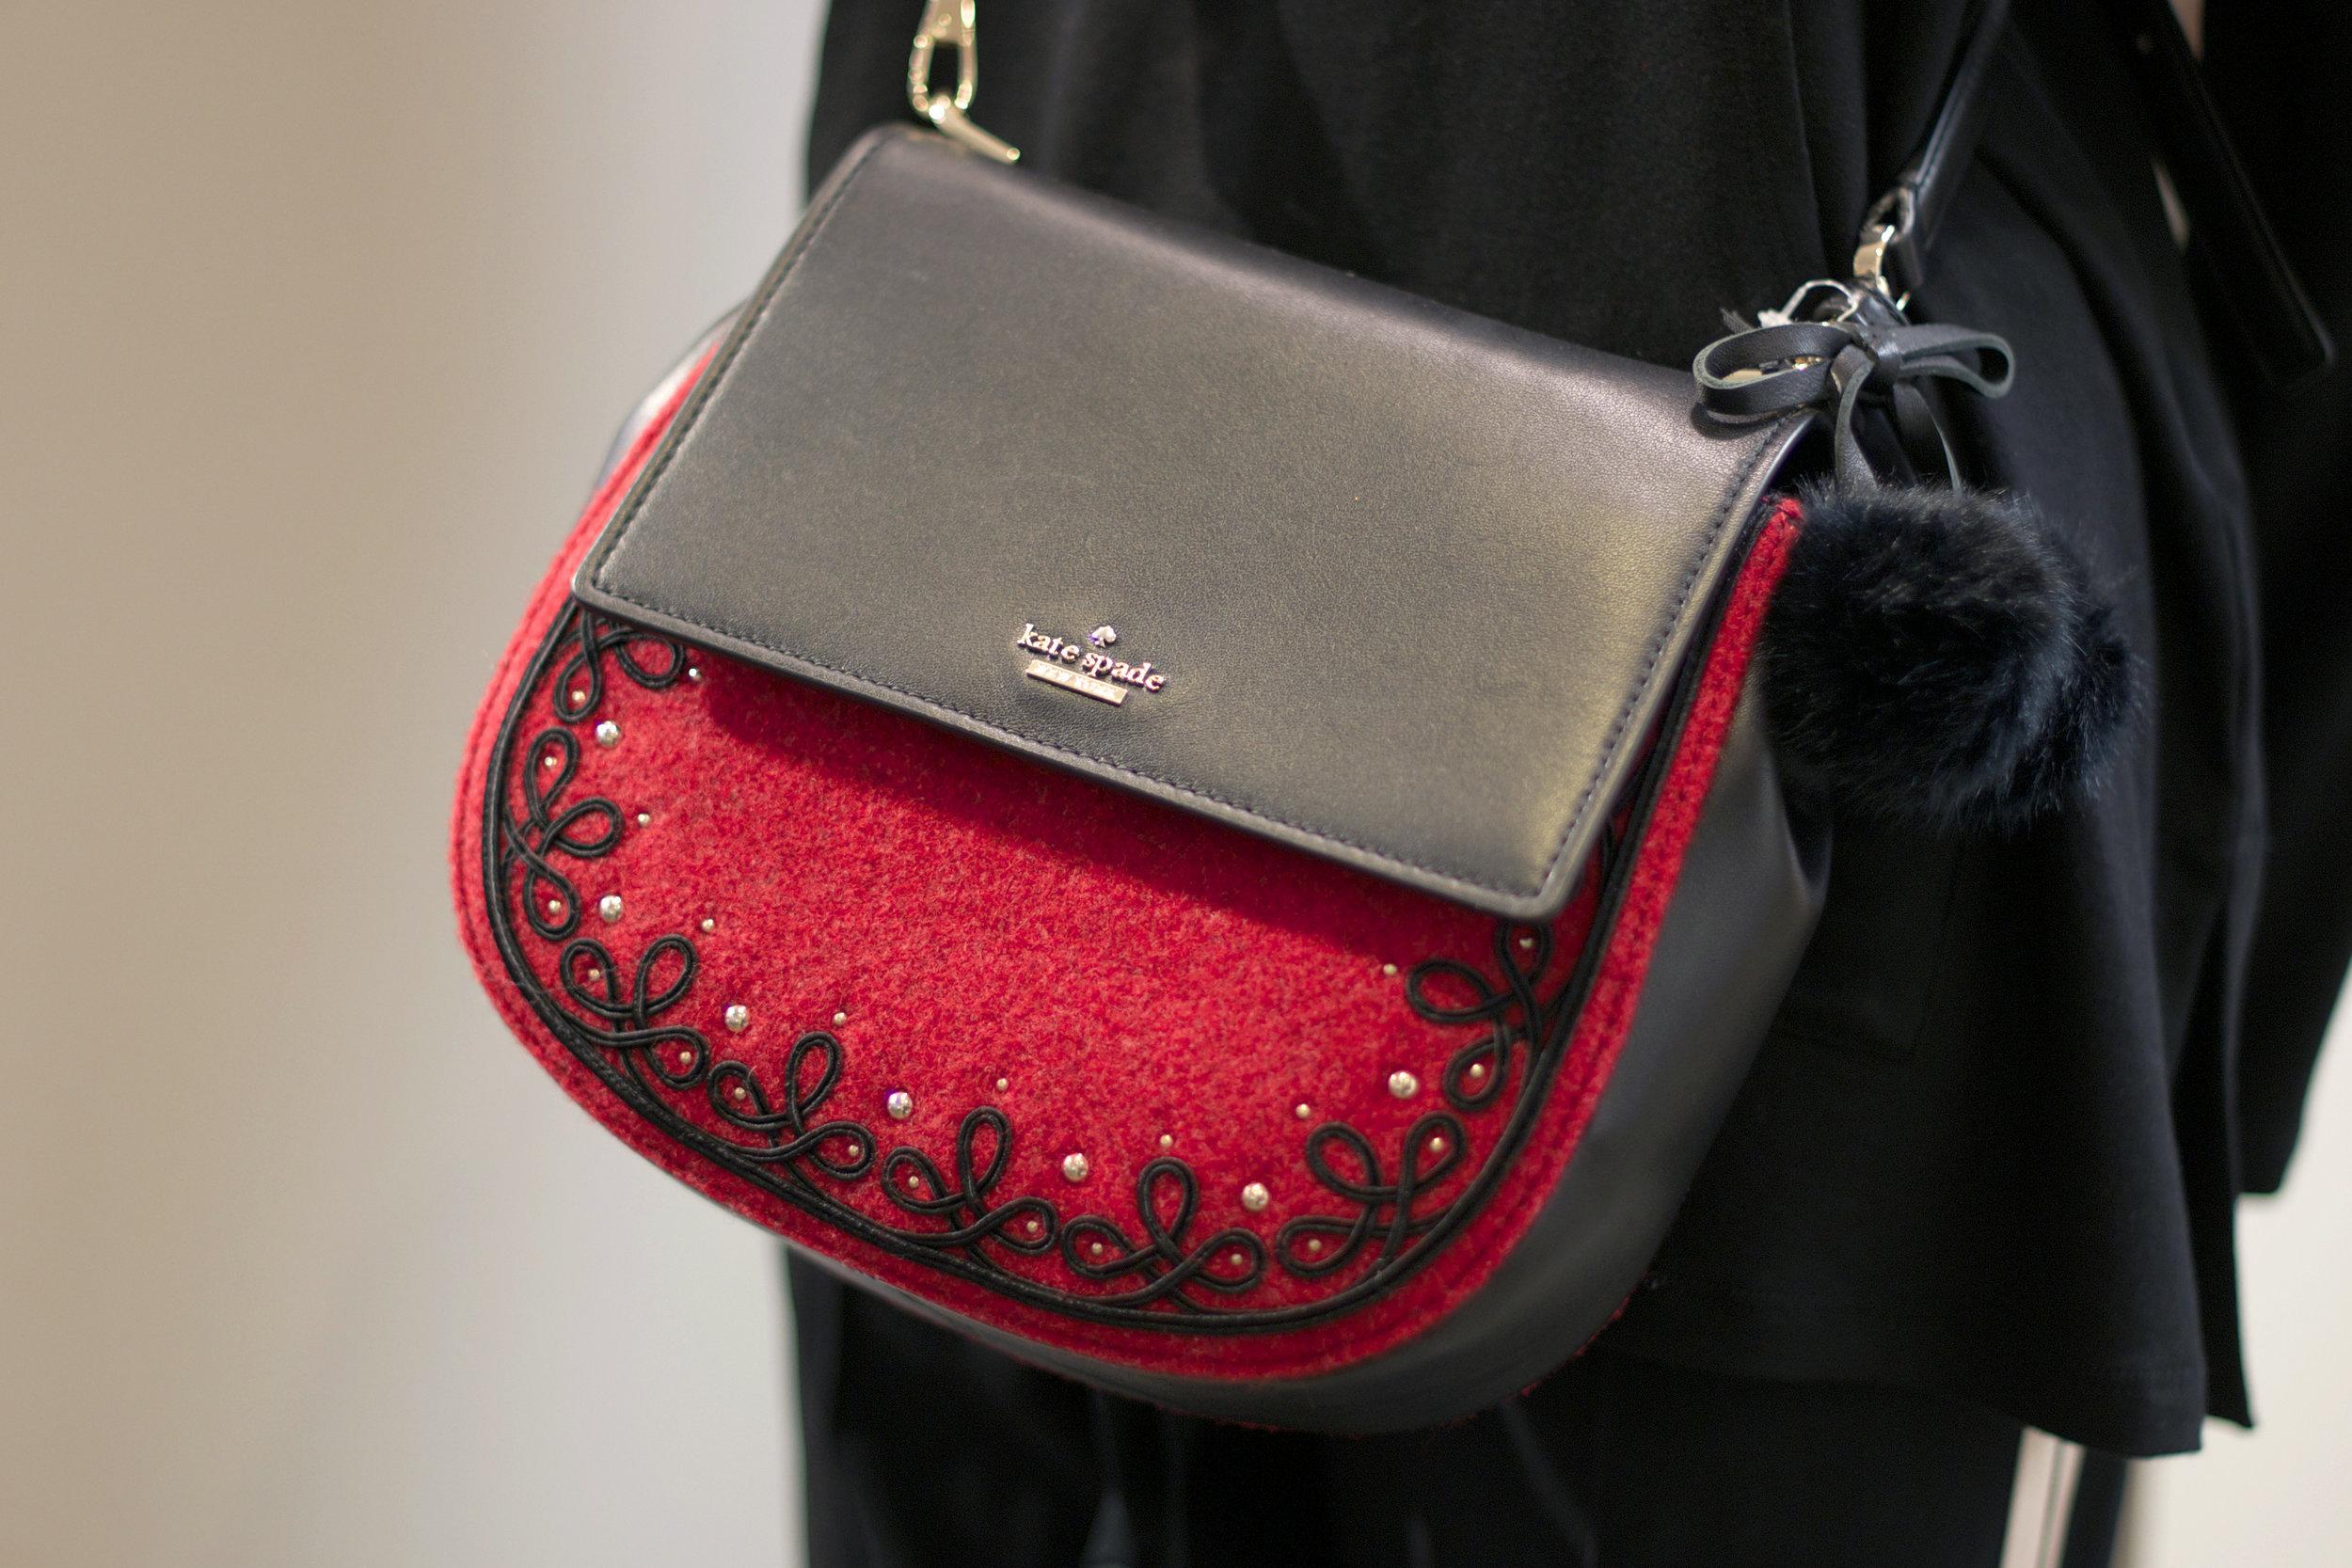 gorgeous-red-and-black-kate-spade-bag.jpg